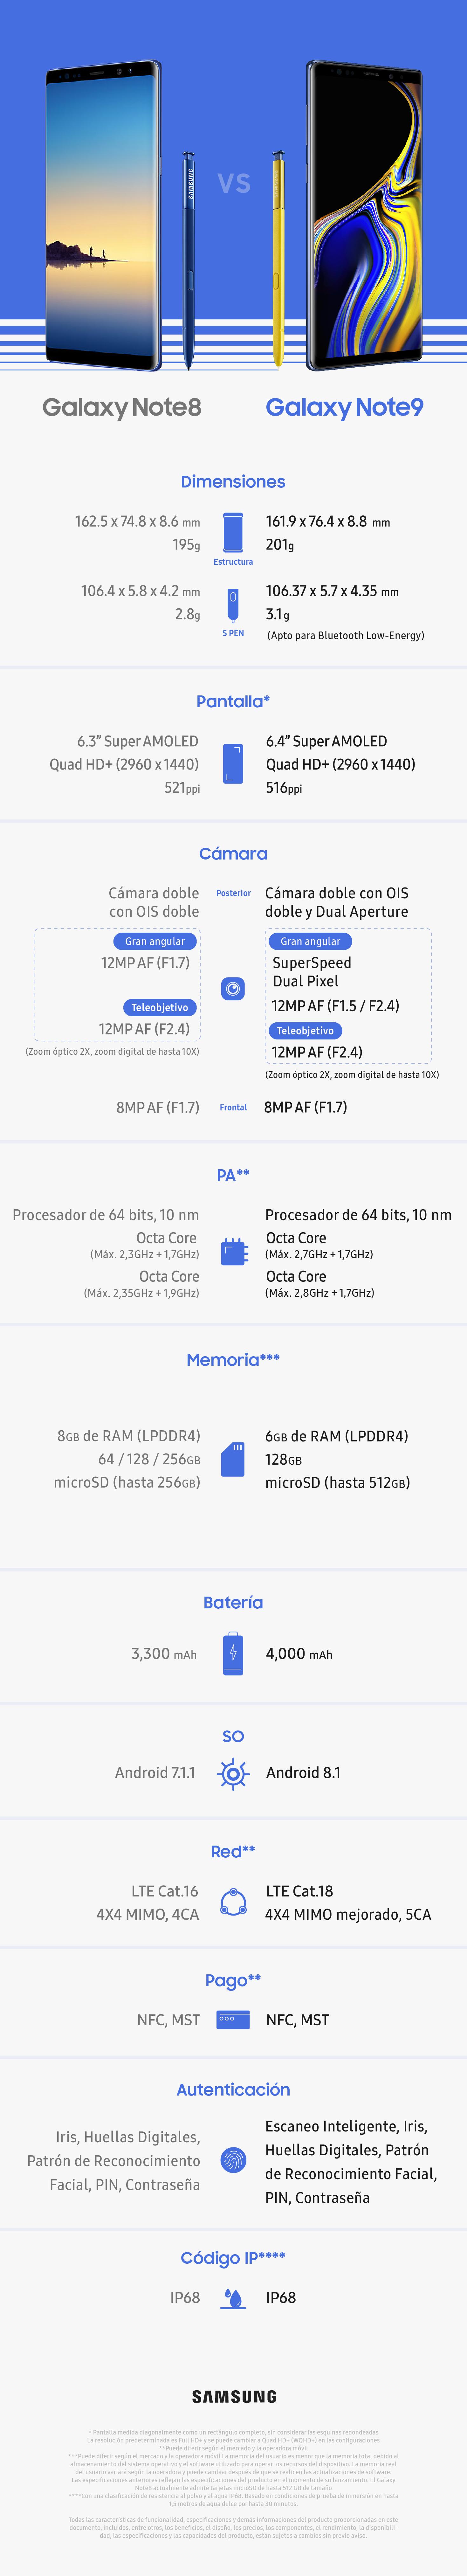 Galaxy Note9 Spec Comparison ESP_Galaxy Note9 Spec Comparison-ESP (1)